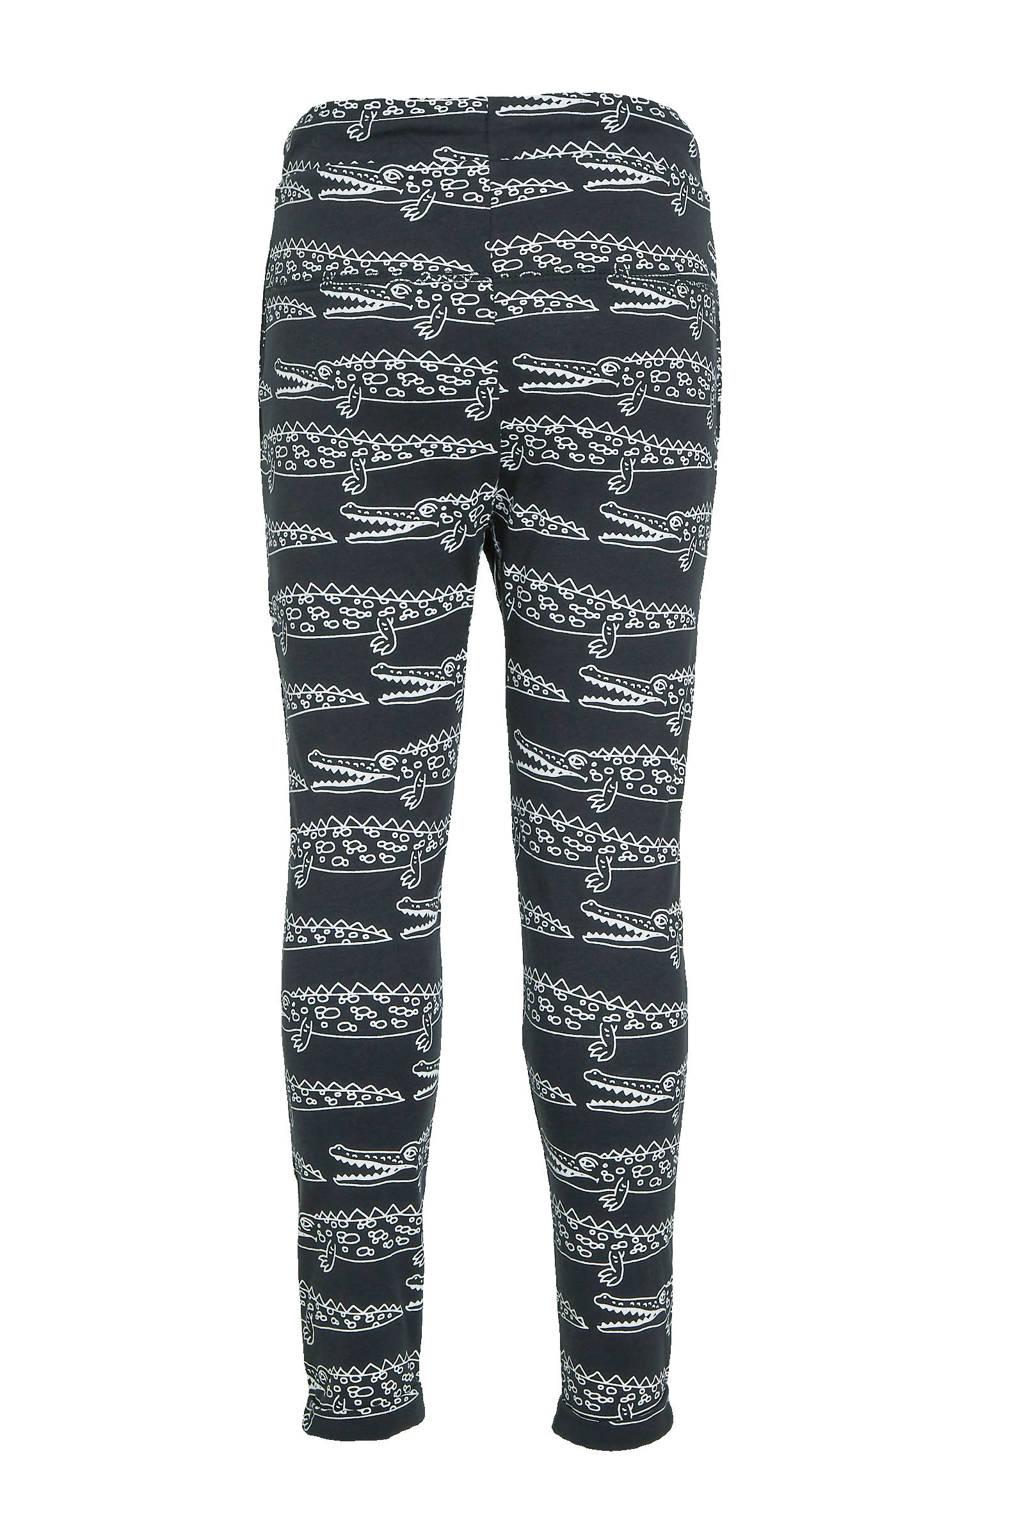 Ellos slim fit broek Alex met dierenprint zwart/wit, Zwart/wit